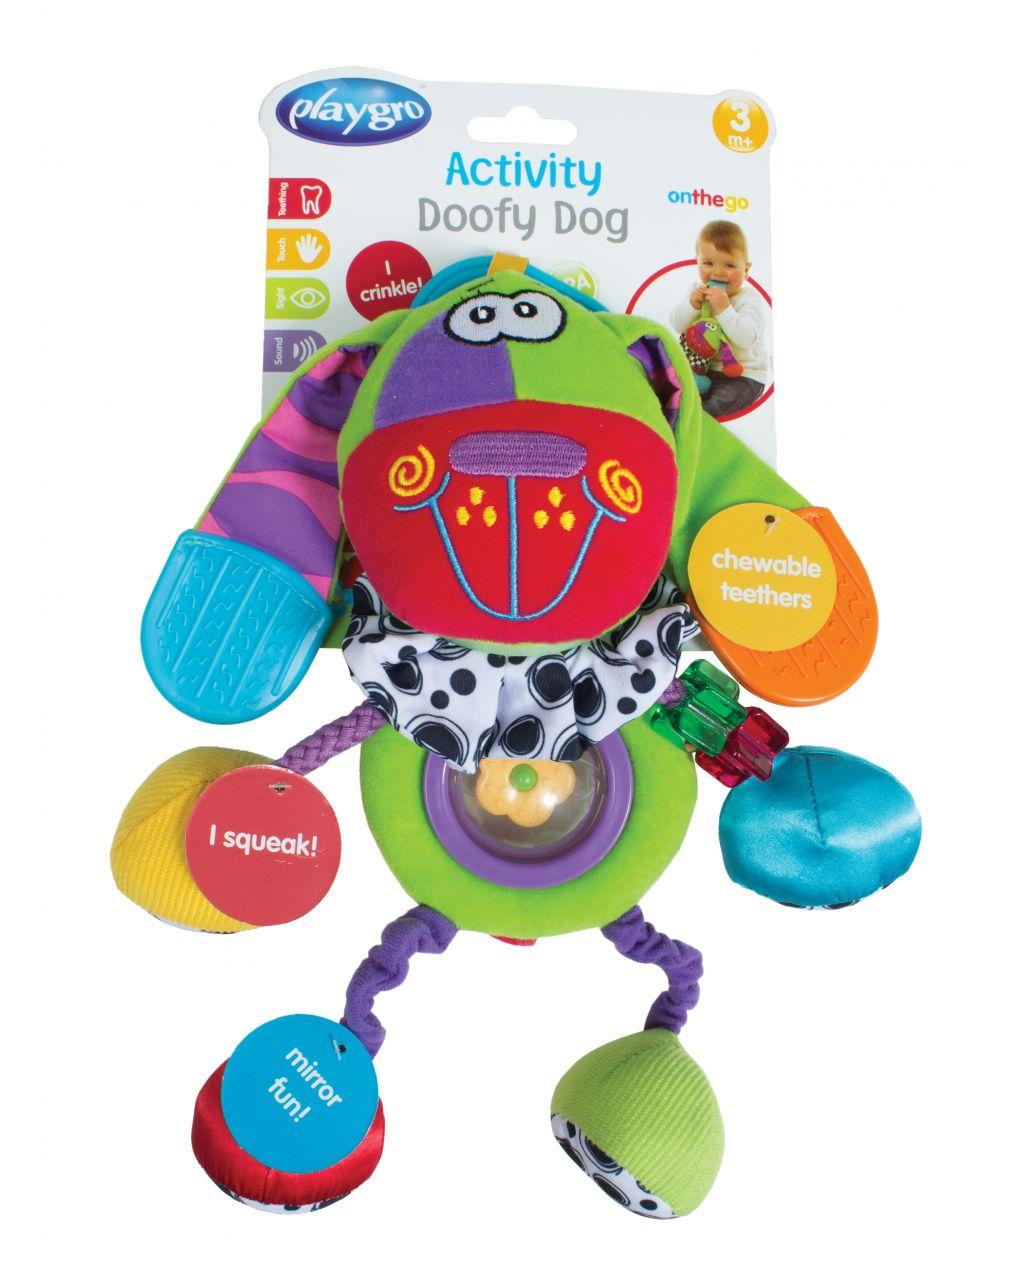 Playgro - activity doofy dog - Playgro